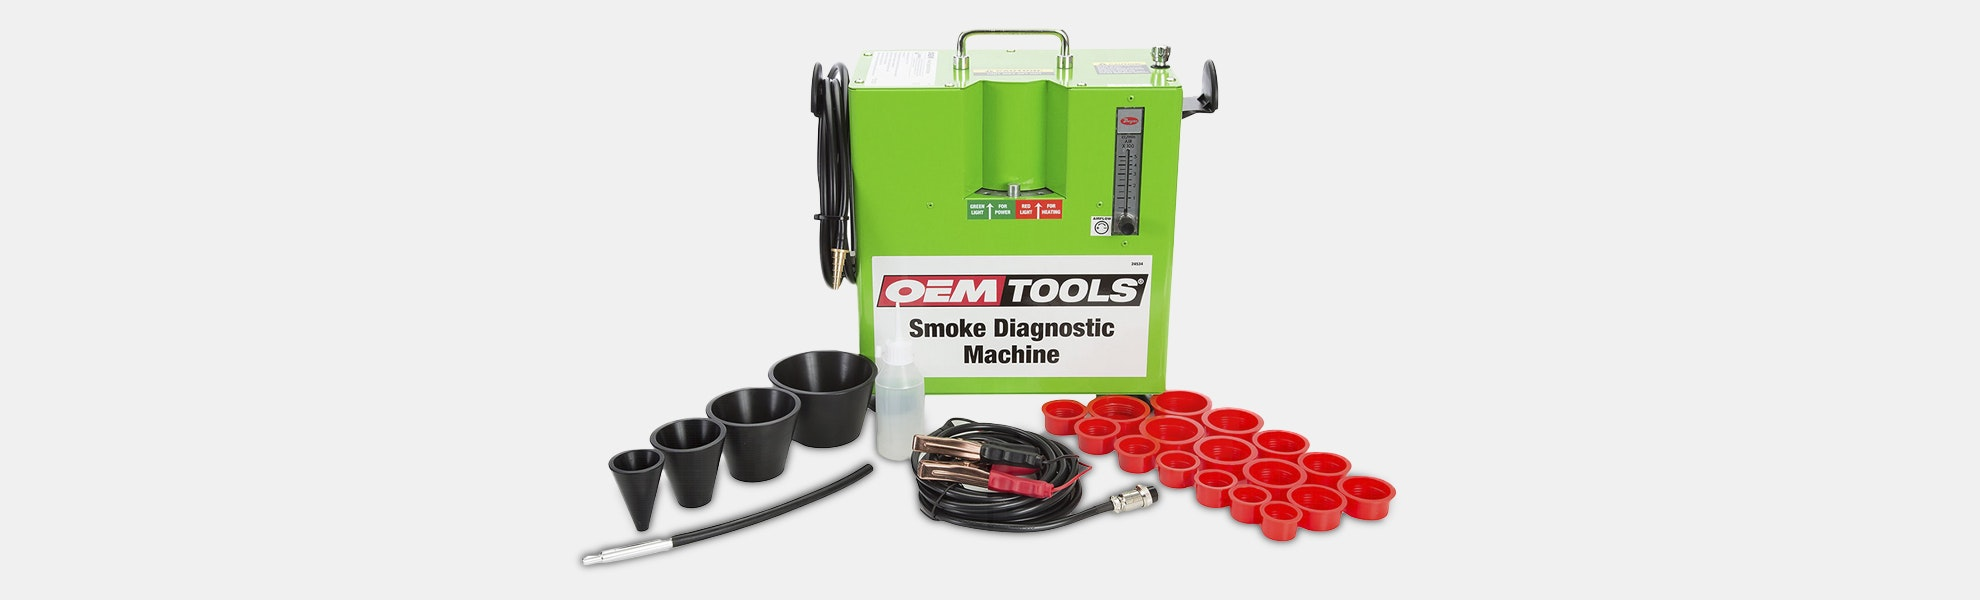 OEM Tools Smoke Diagnostic Machine